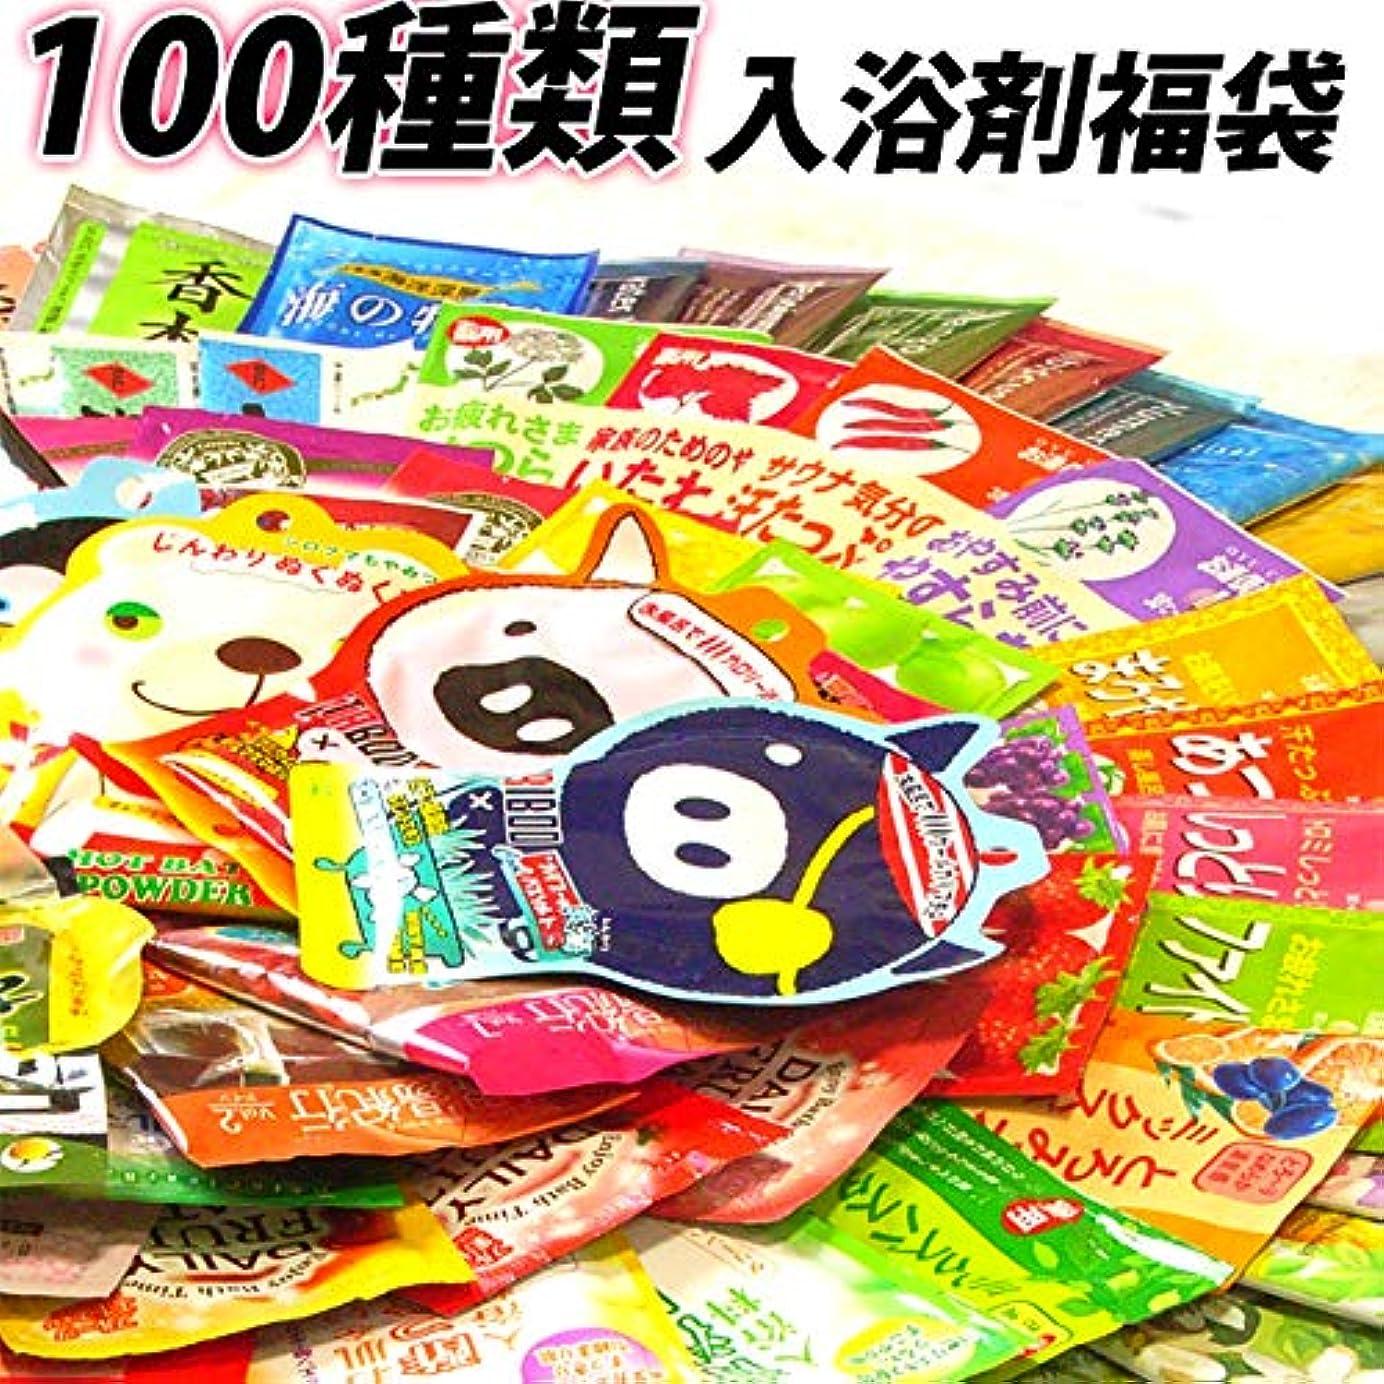 究極の糞接地人気 入浴剤 福袋 100包入り!